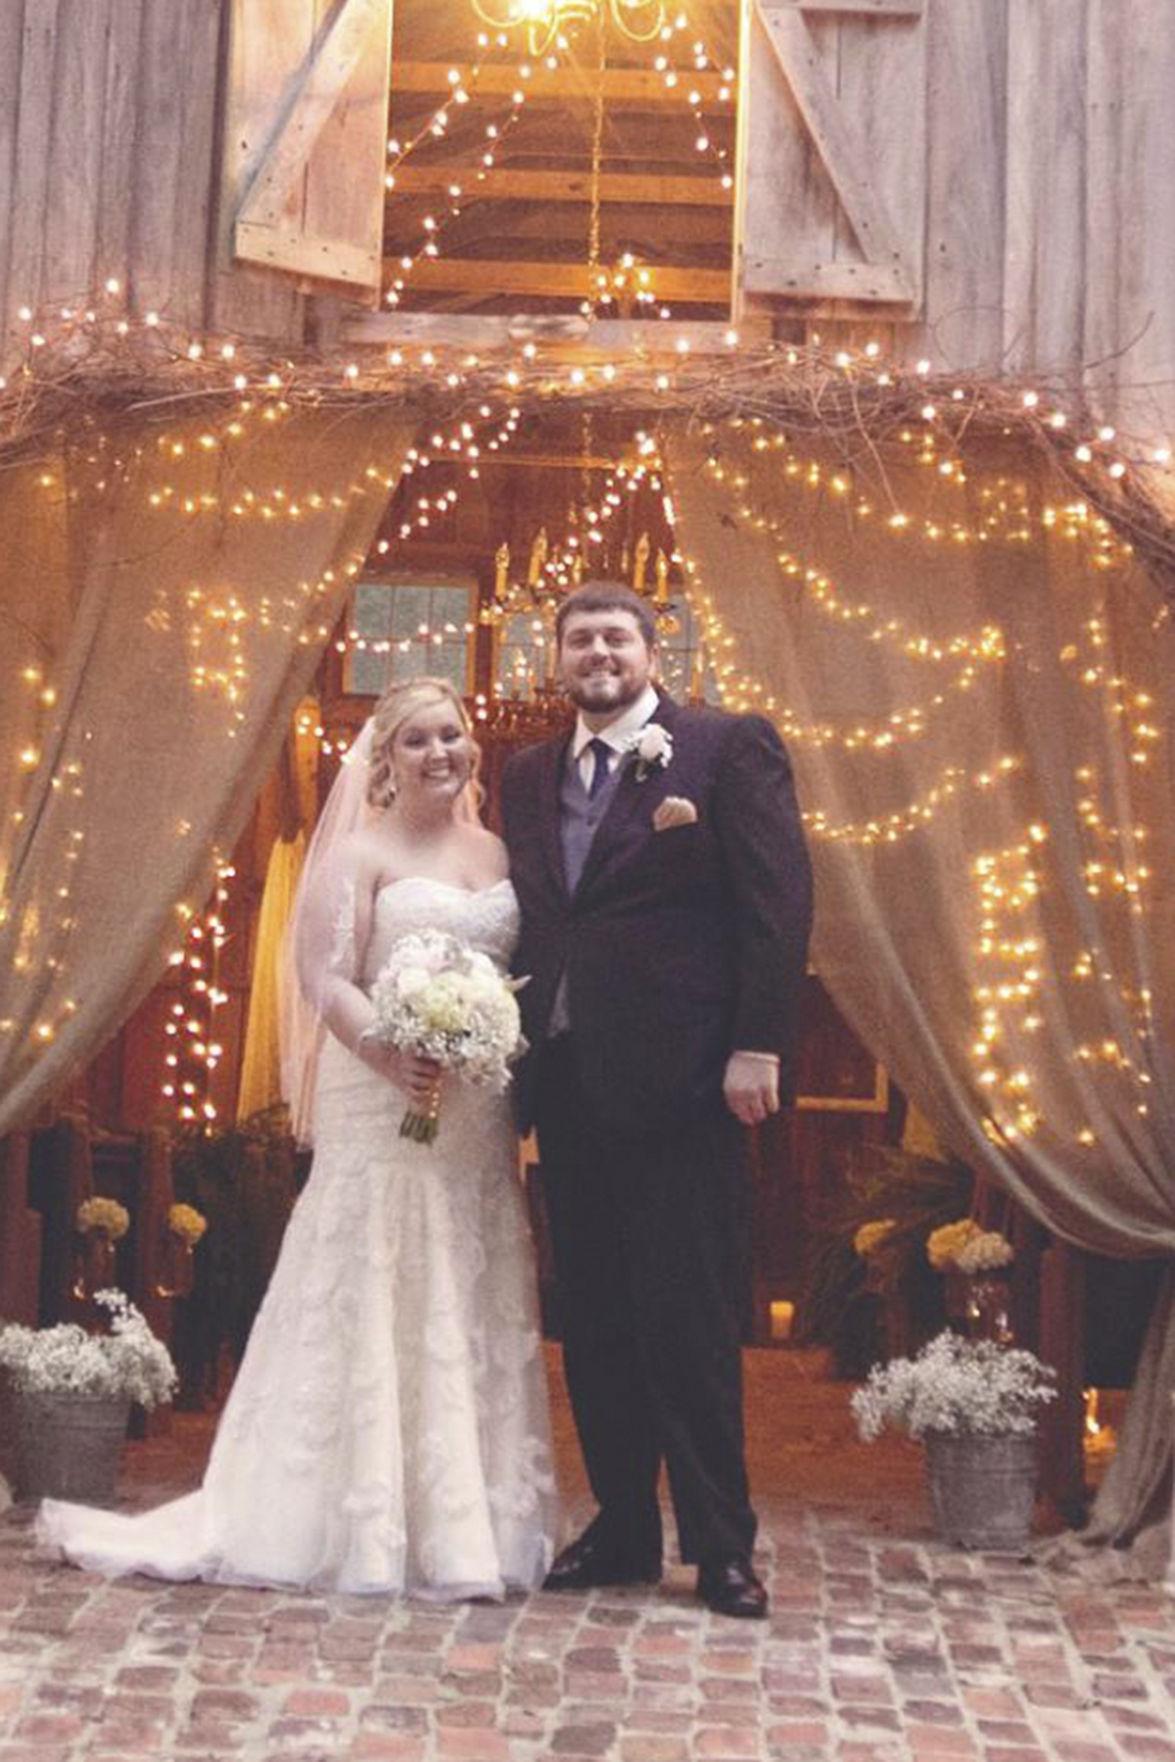 Amber Brooke Davis and Gregory Buck Thornton | Weddings | The News